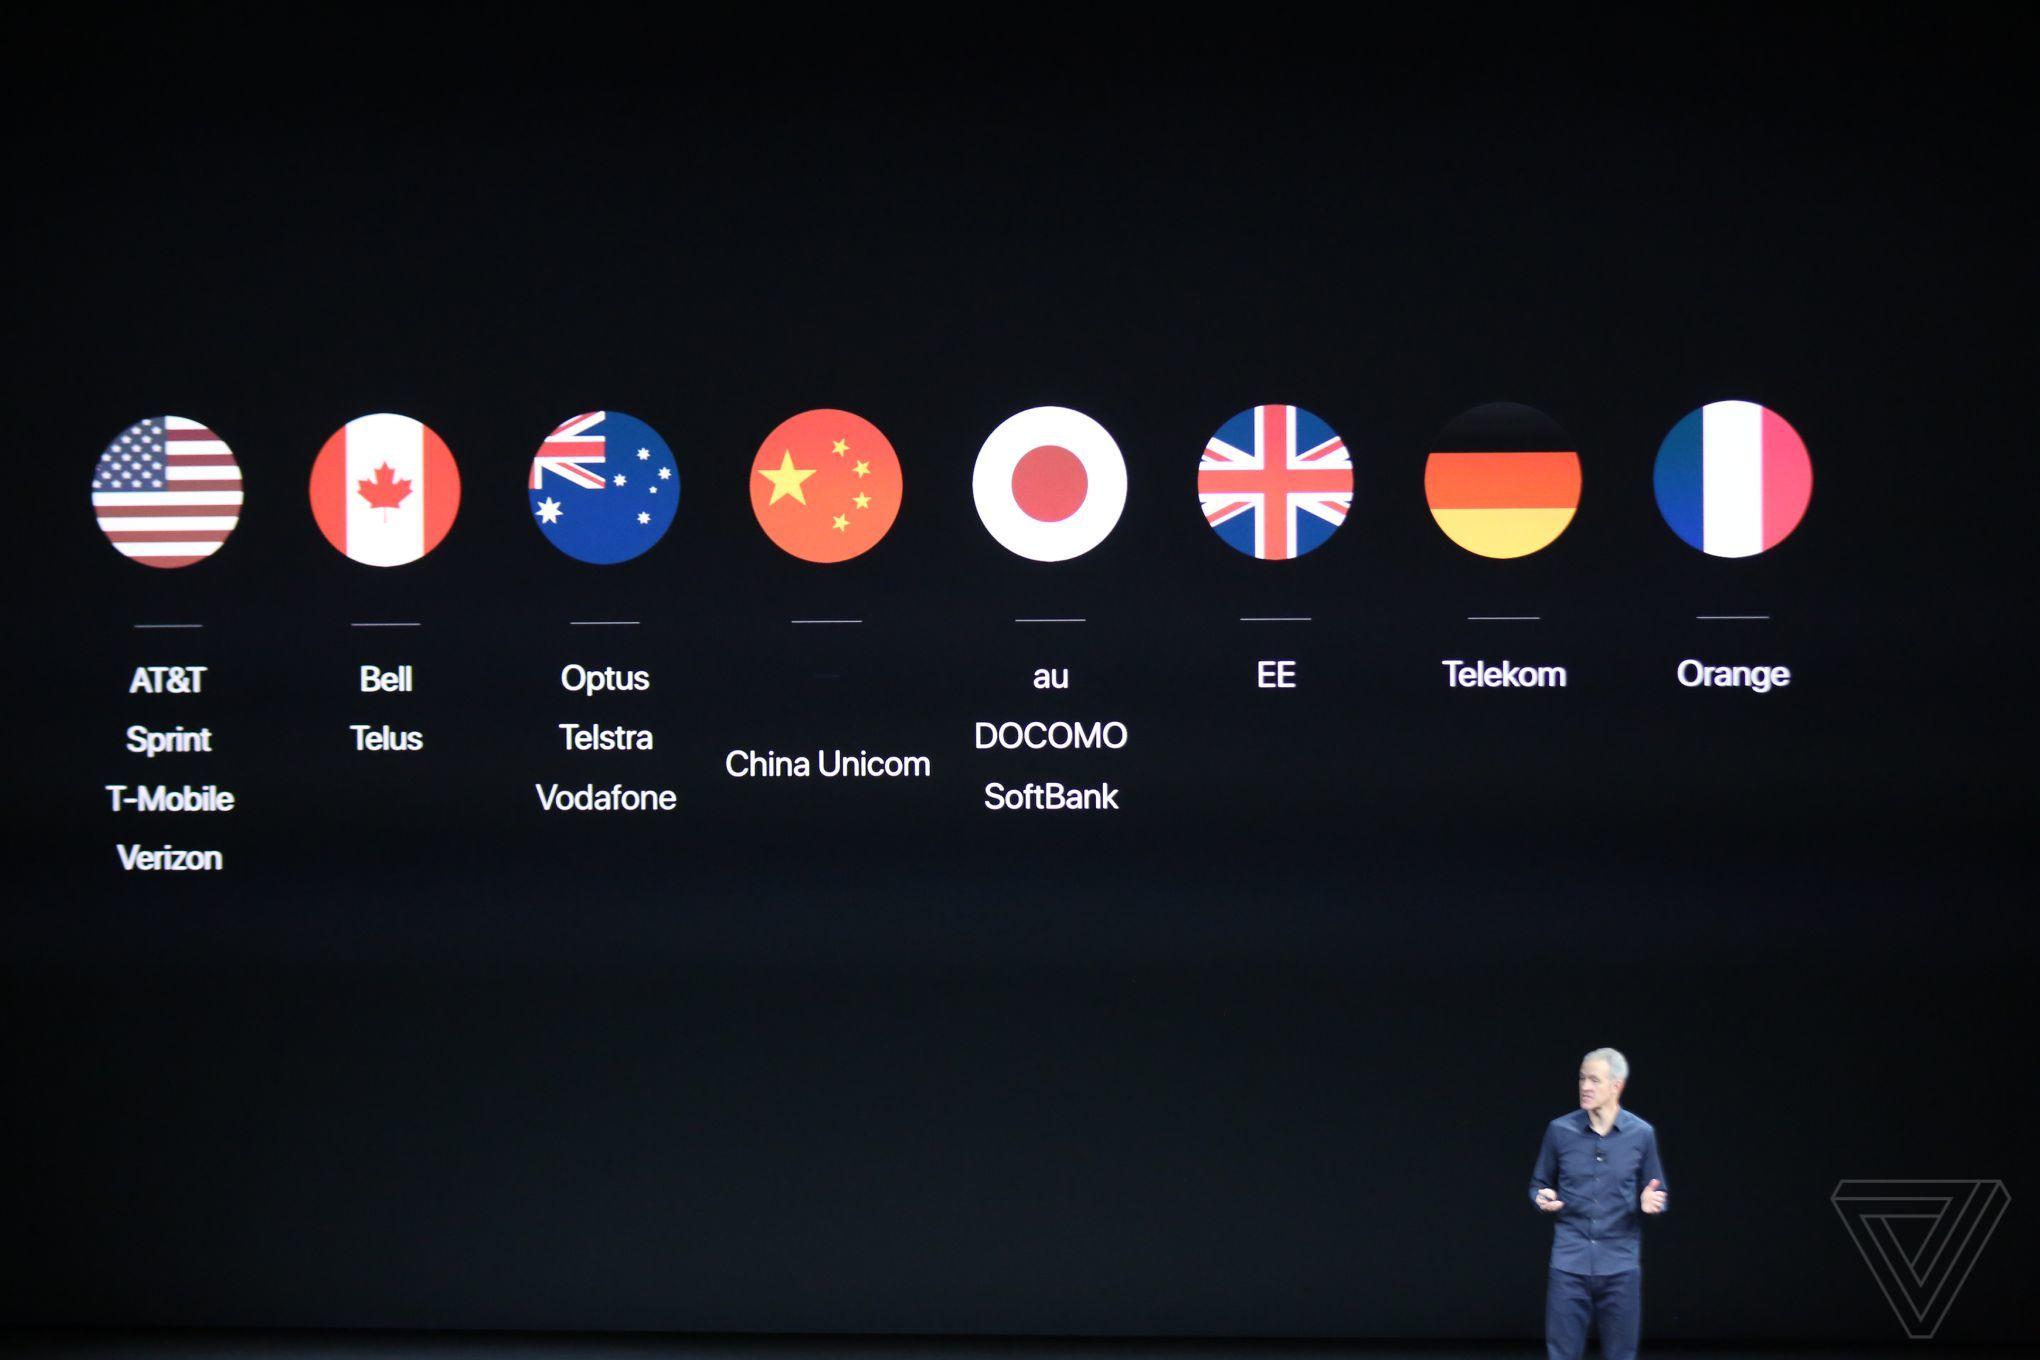 apple-iphone-2017-20170912-10834.JPG